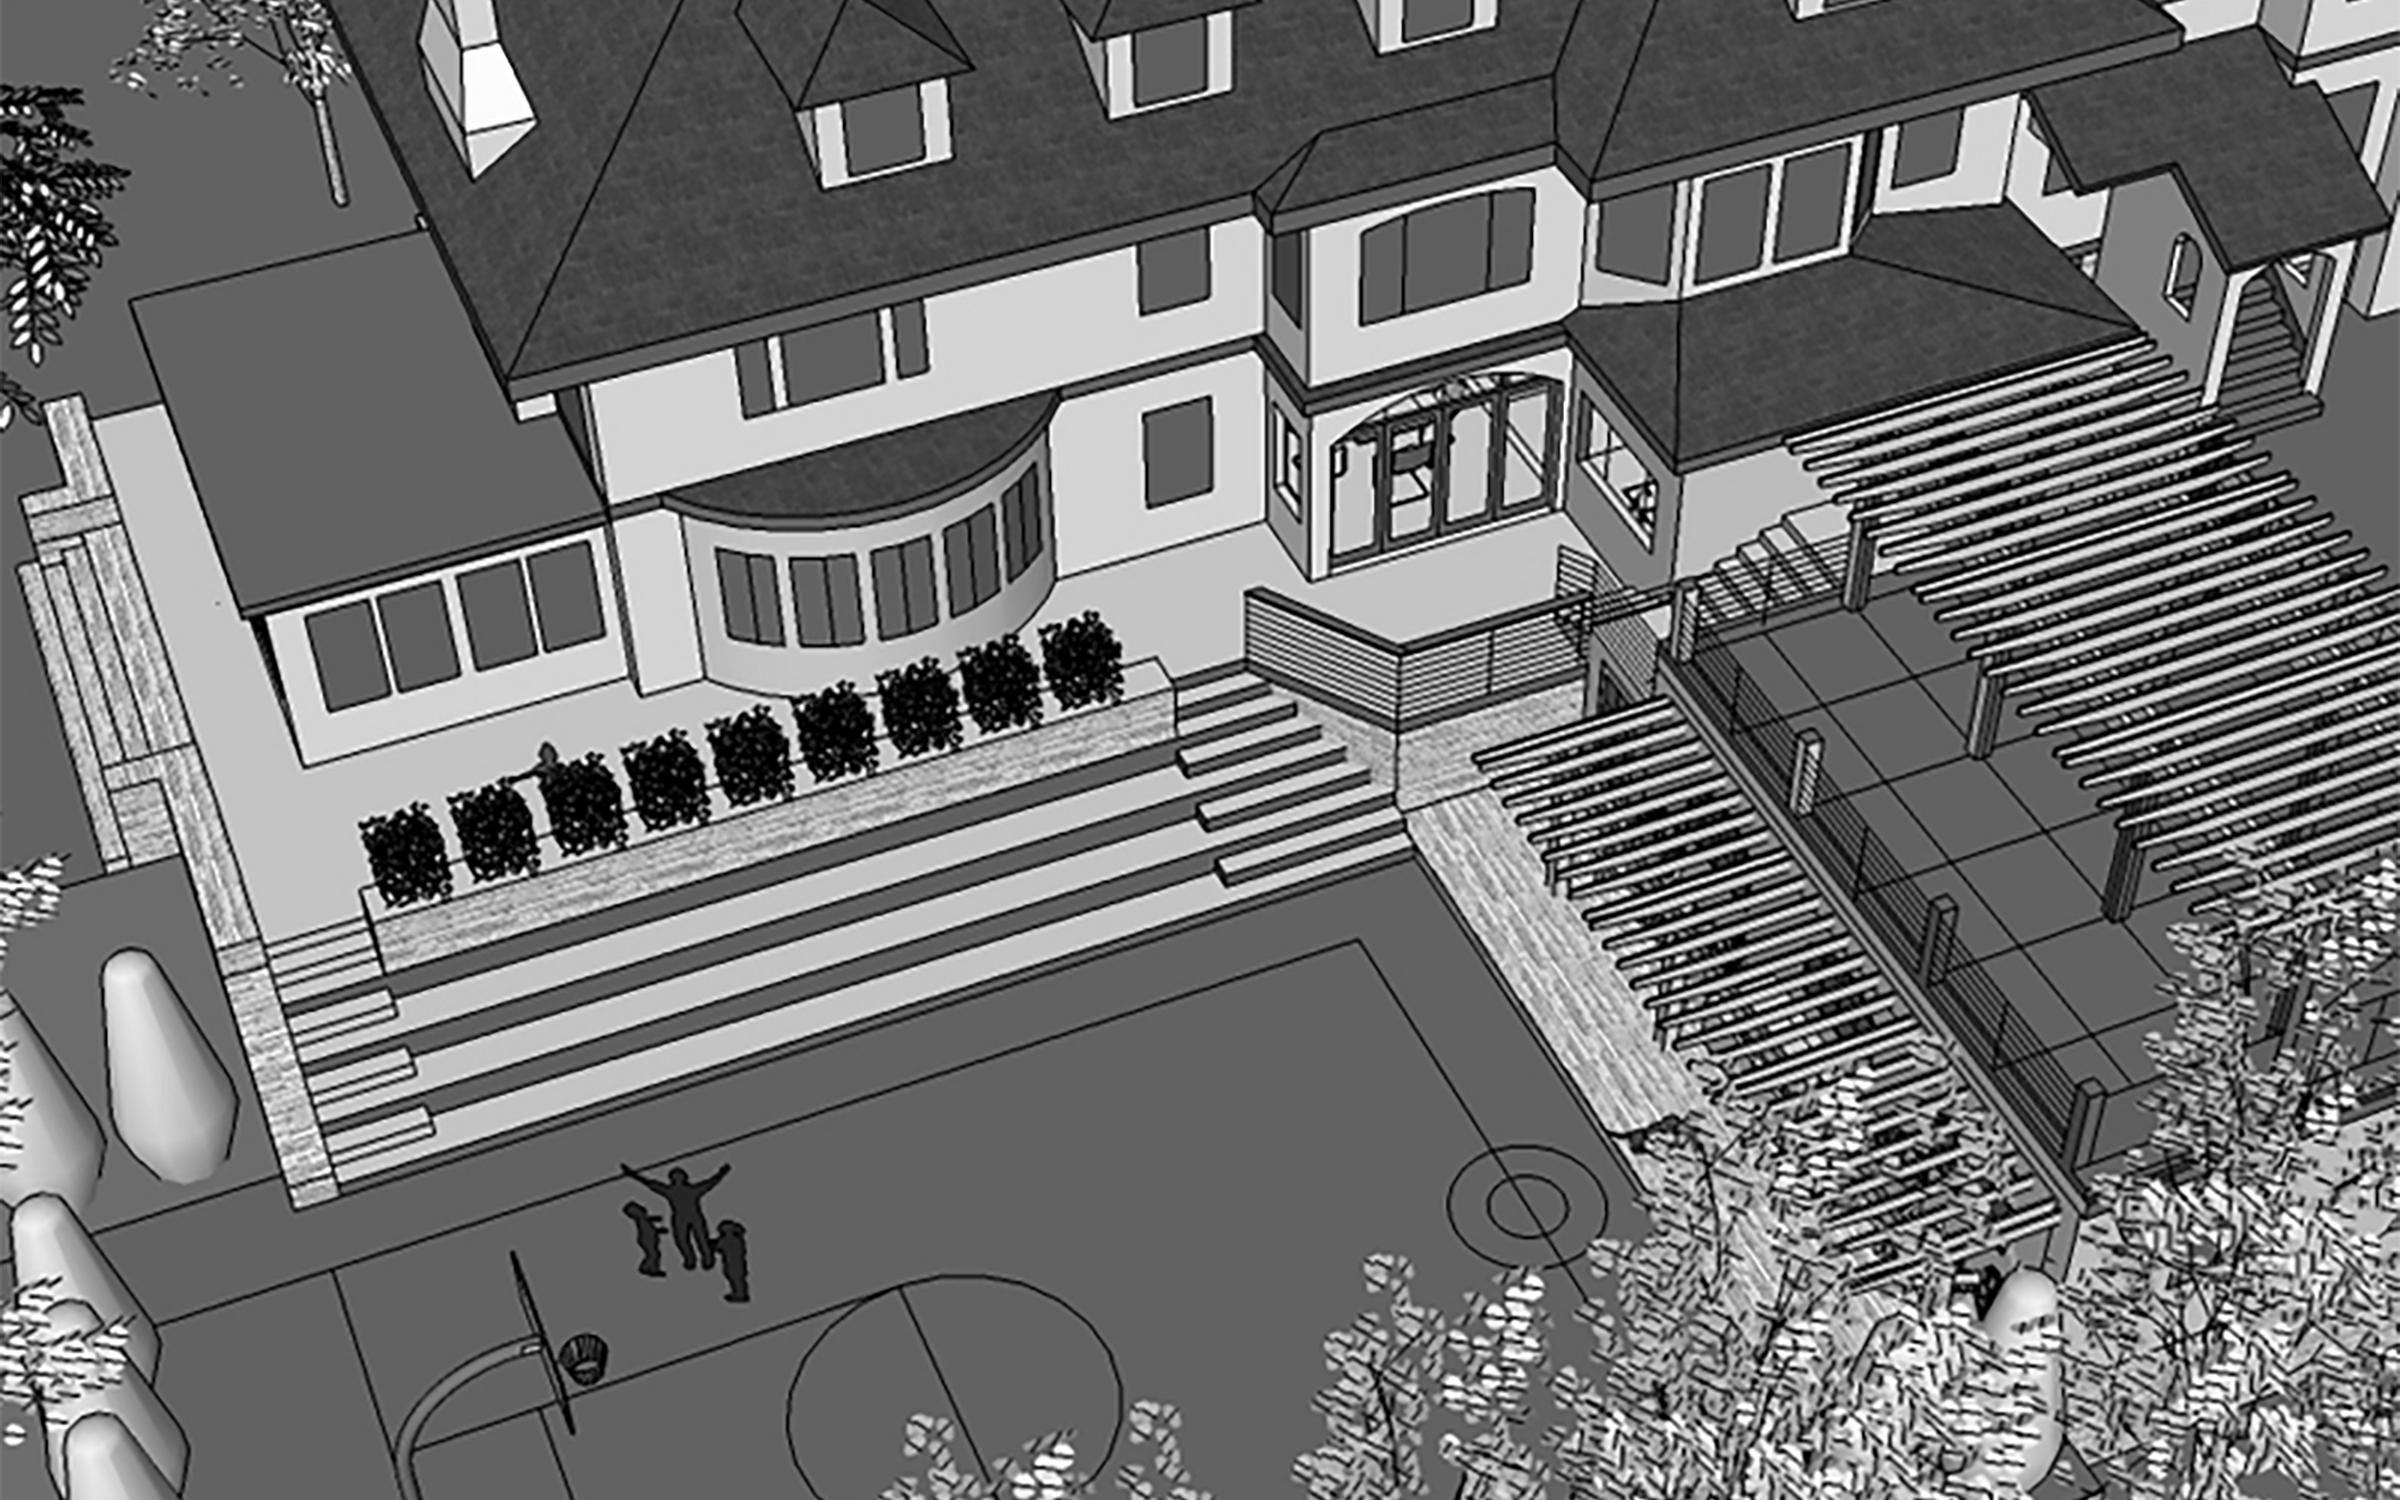 Fisher-Hill-Residence-Epstein-Joslin-01.jpg